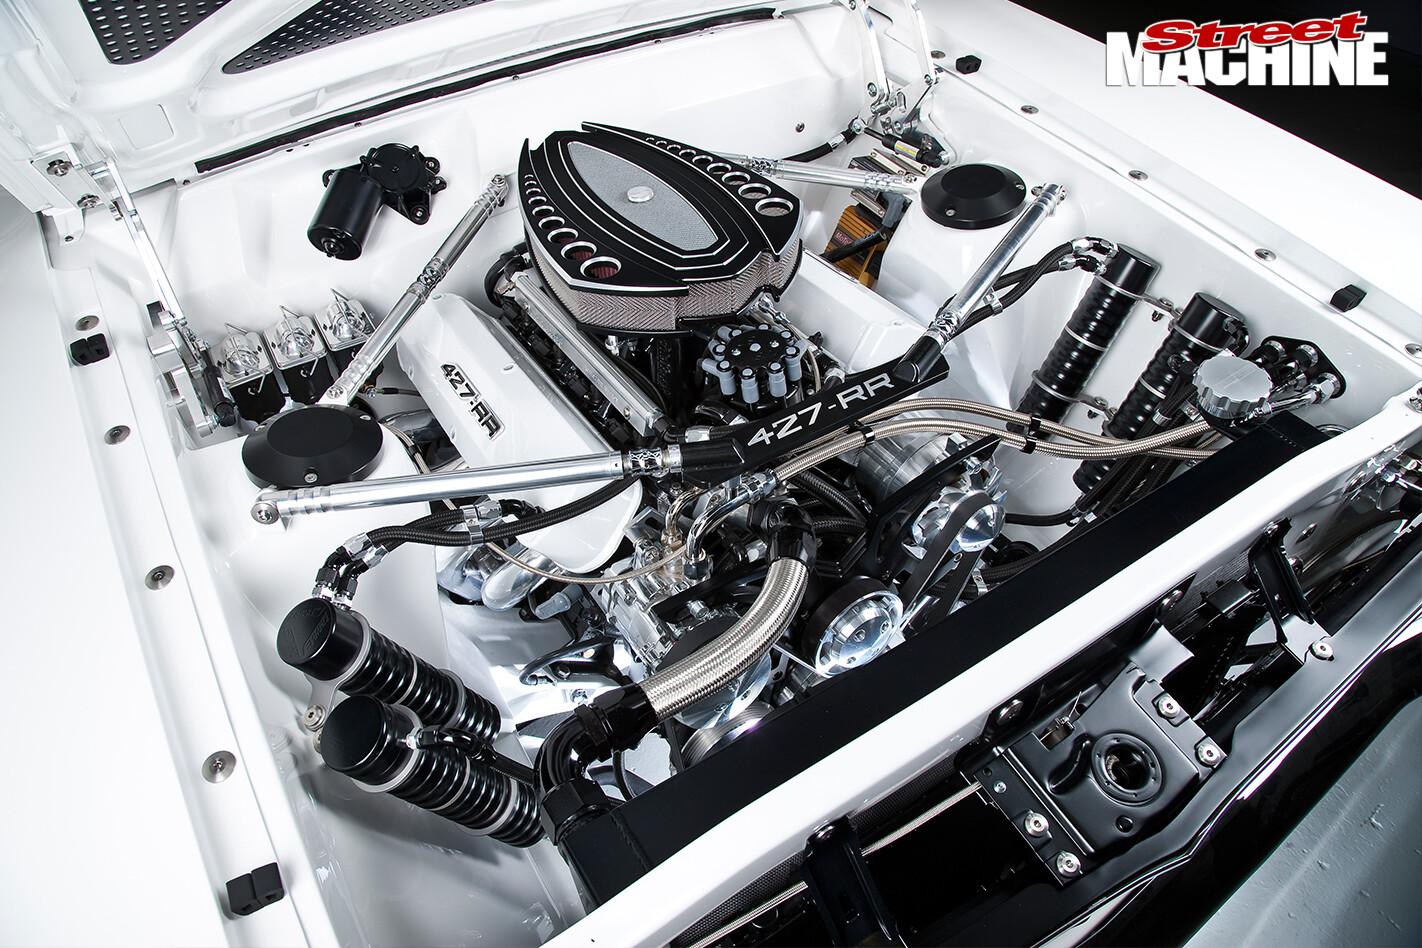 Ford -Falcon -XY-Elite -engine -bay -2